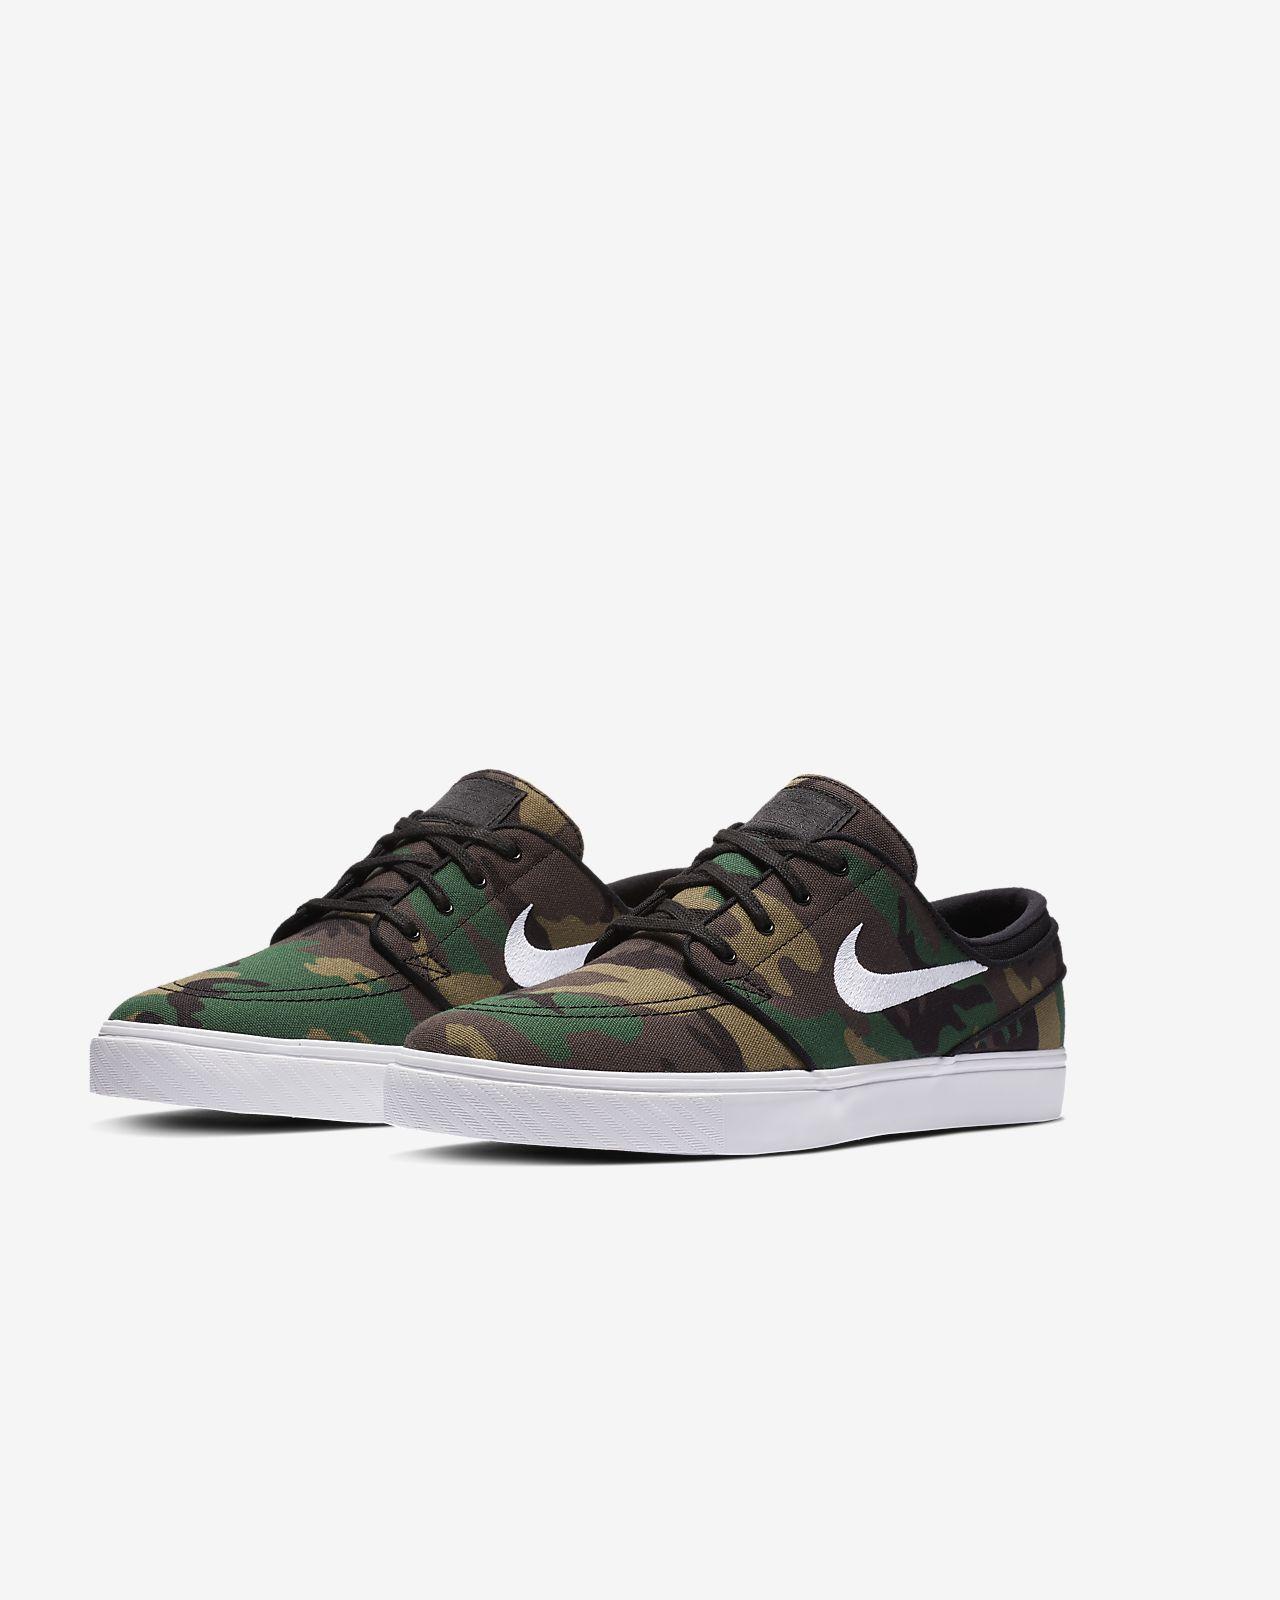 buy online 5ab7d 73f8f ... Nike SB Zoom Stefan Janoski Canvas Men s Skate Shoe